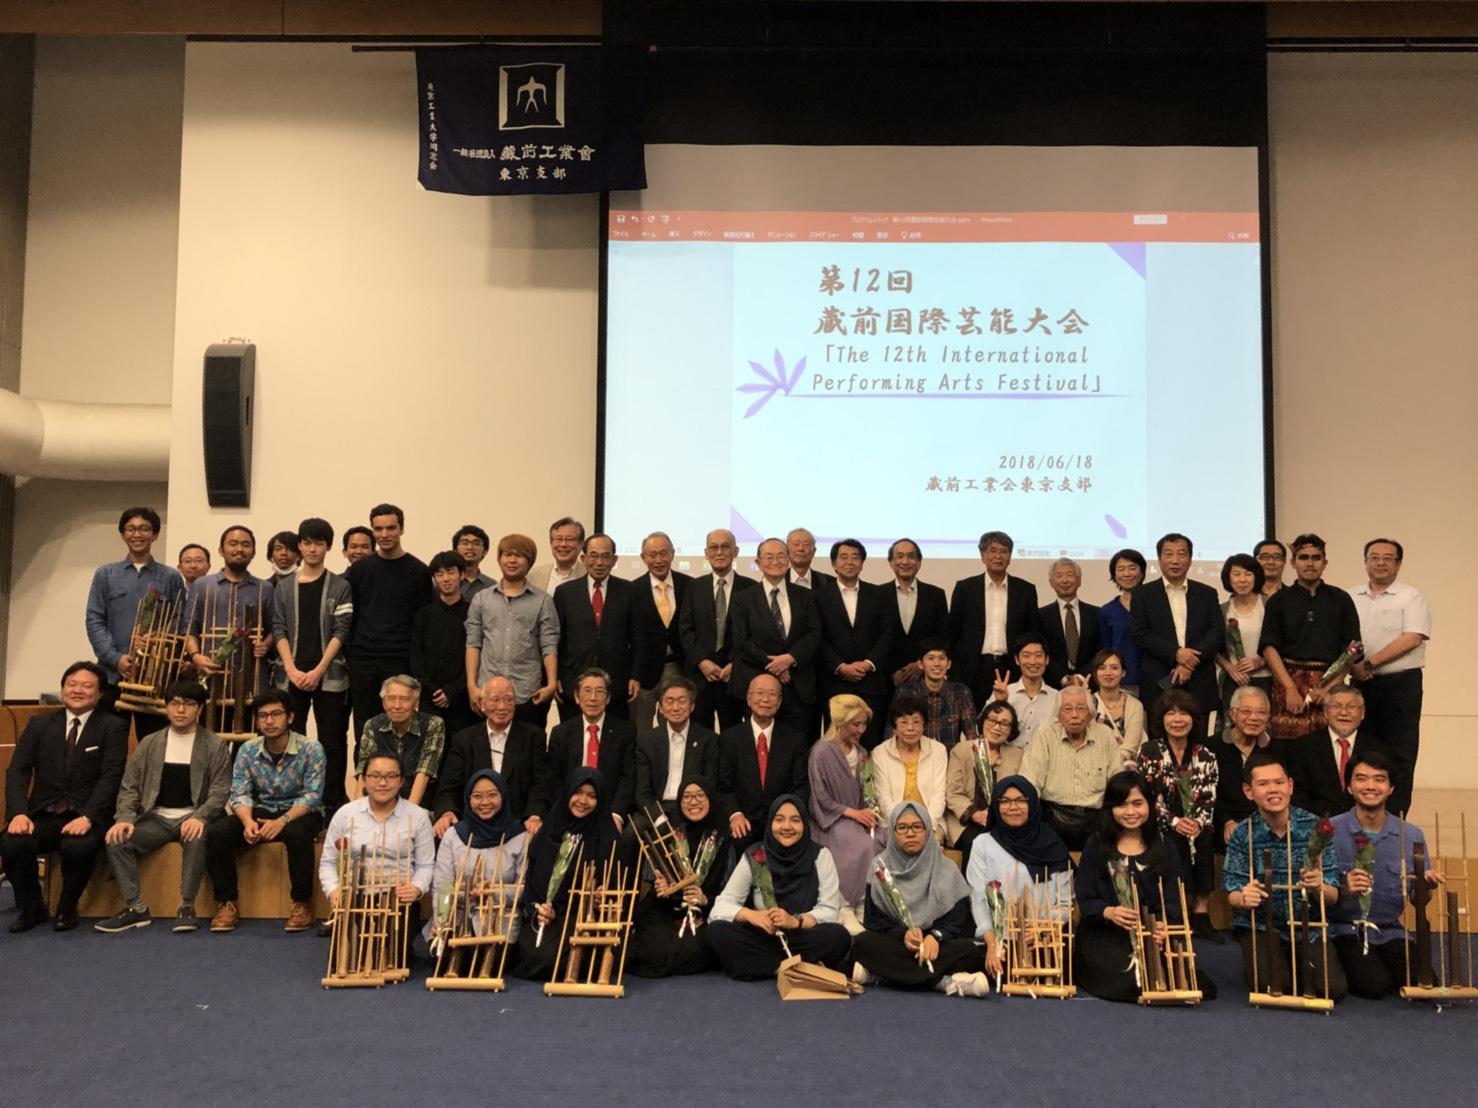 Foto bersama para peserta dan tamu undangan The 12th International Performing Arts Festival